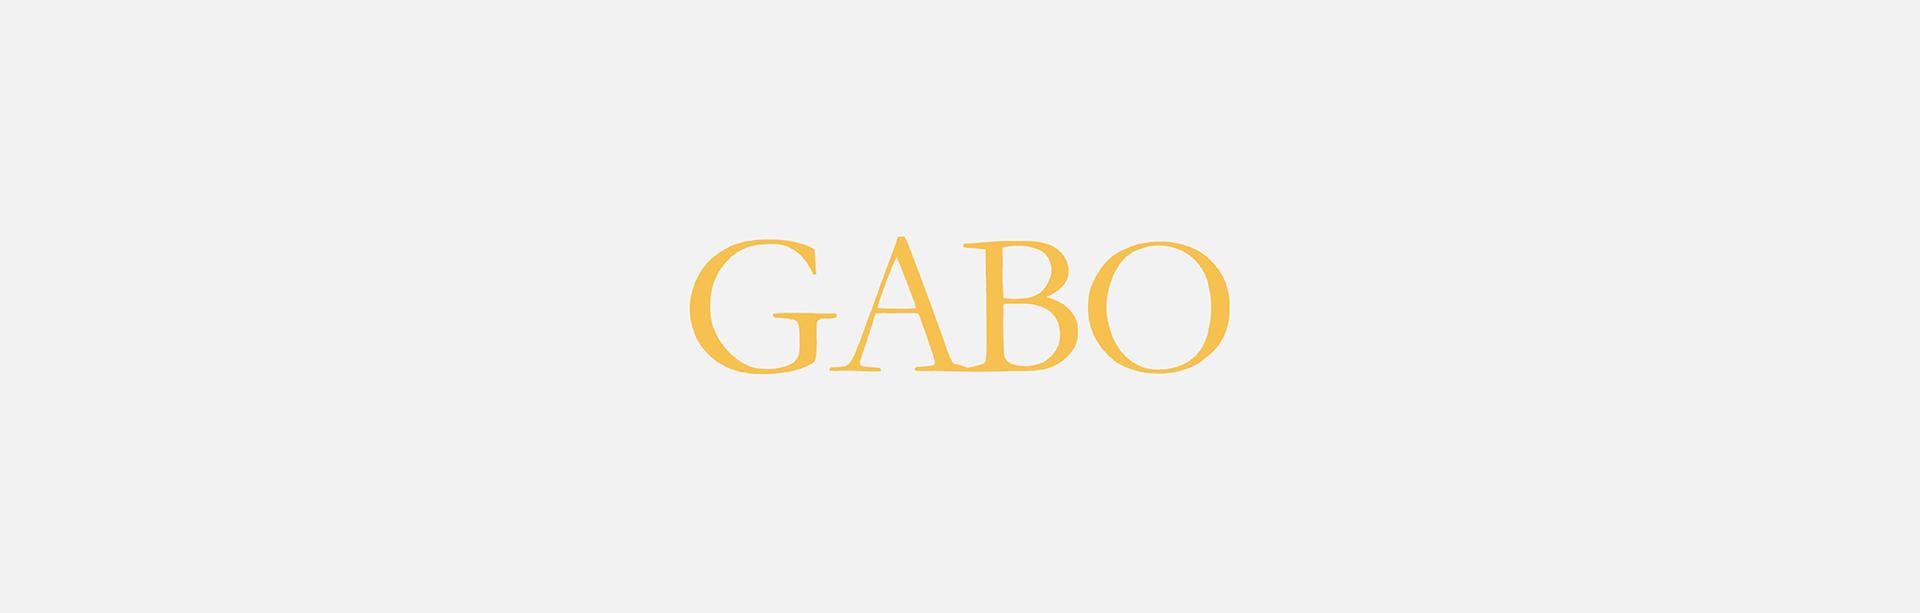 GABO Könyvkiadó